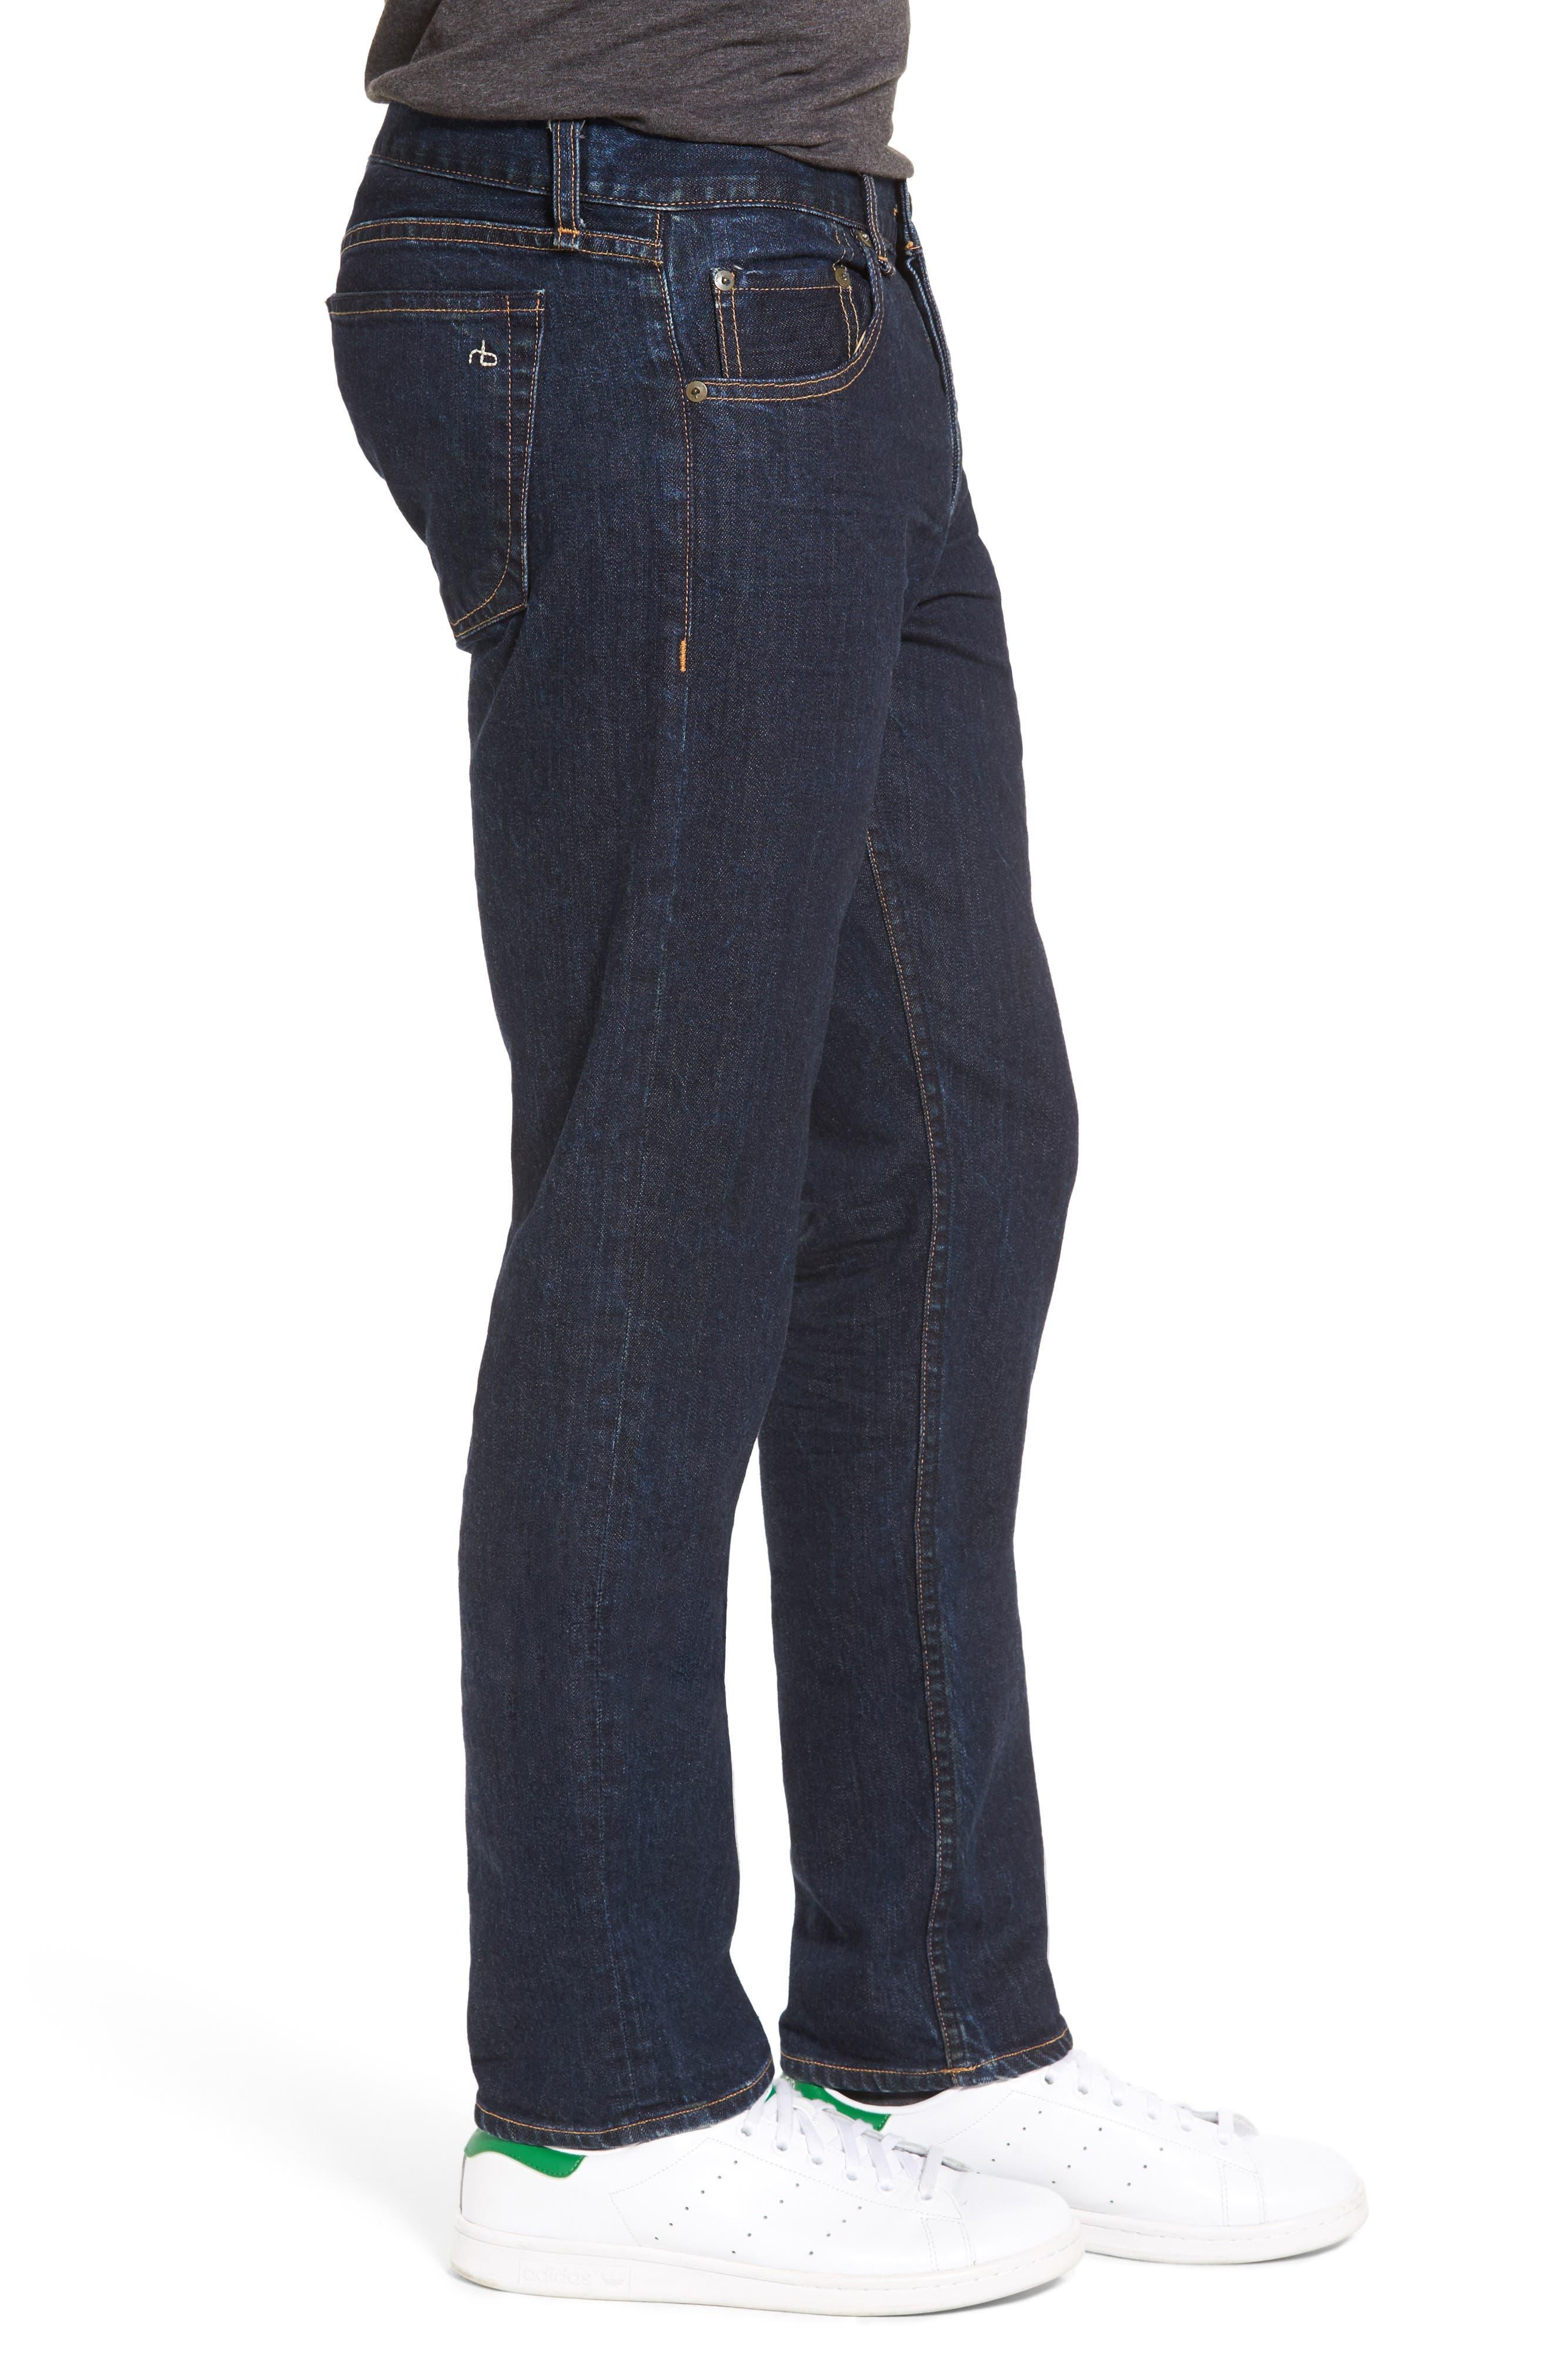 RAG & BONE, Standard Issue Fit 3 Slim Straight Leg Jeans, Alternate thumbnail 4, color, HERITAGE